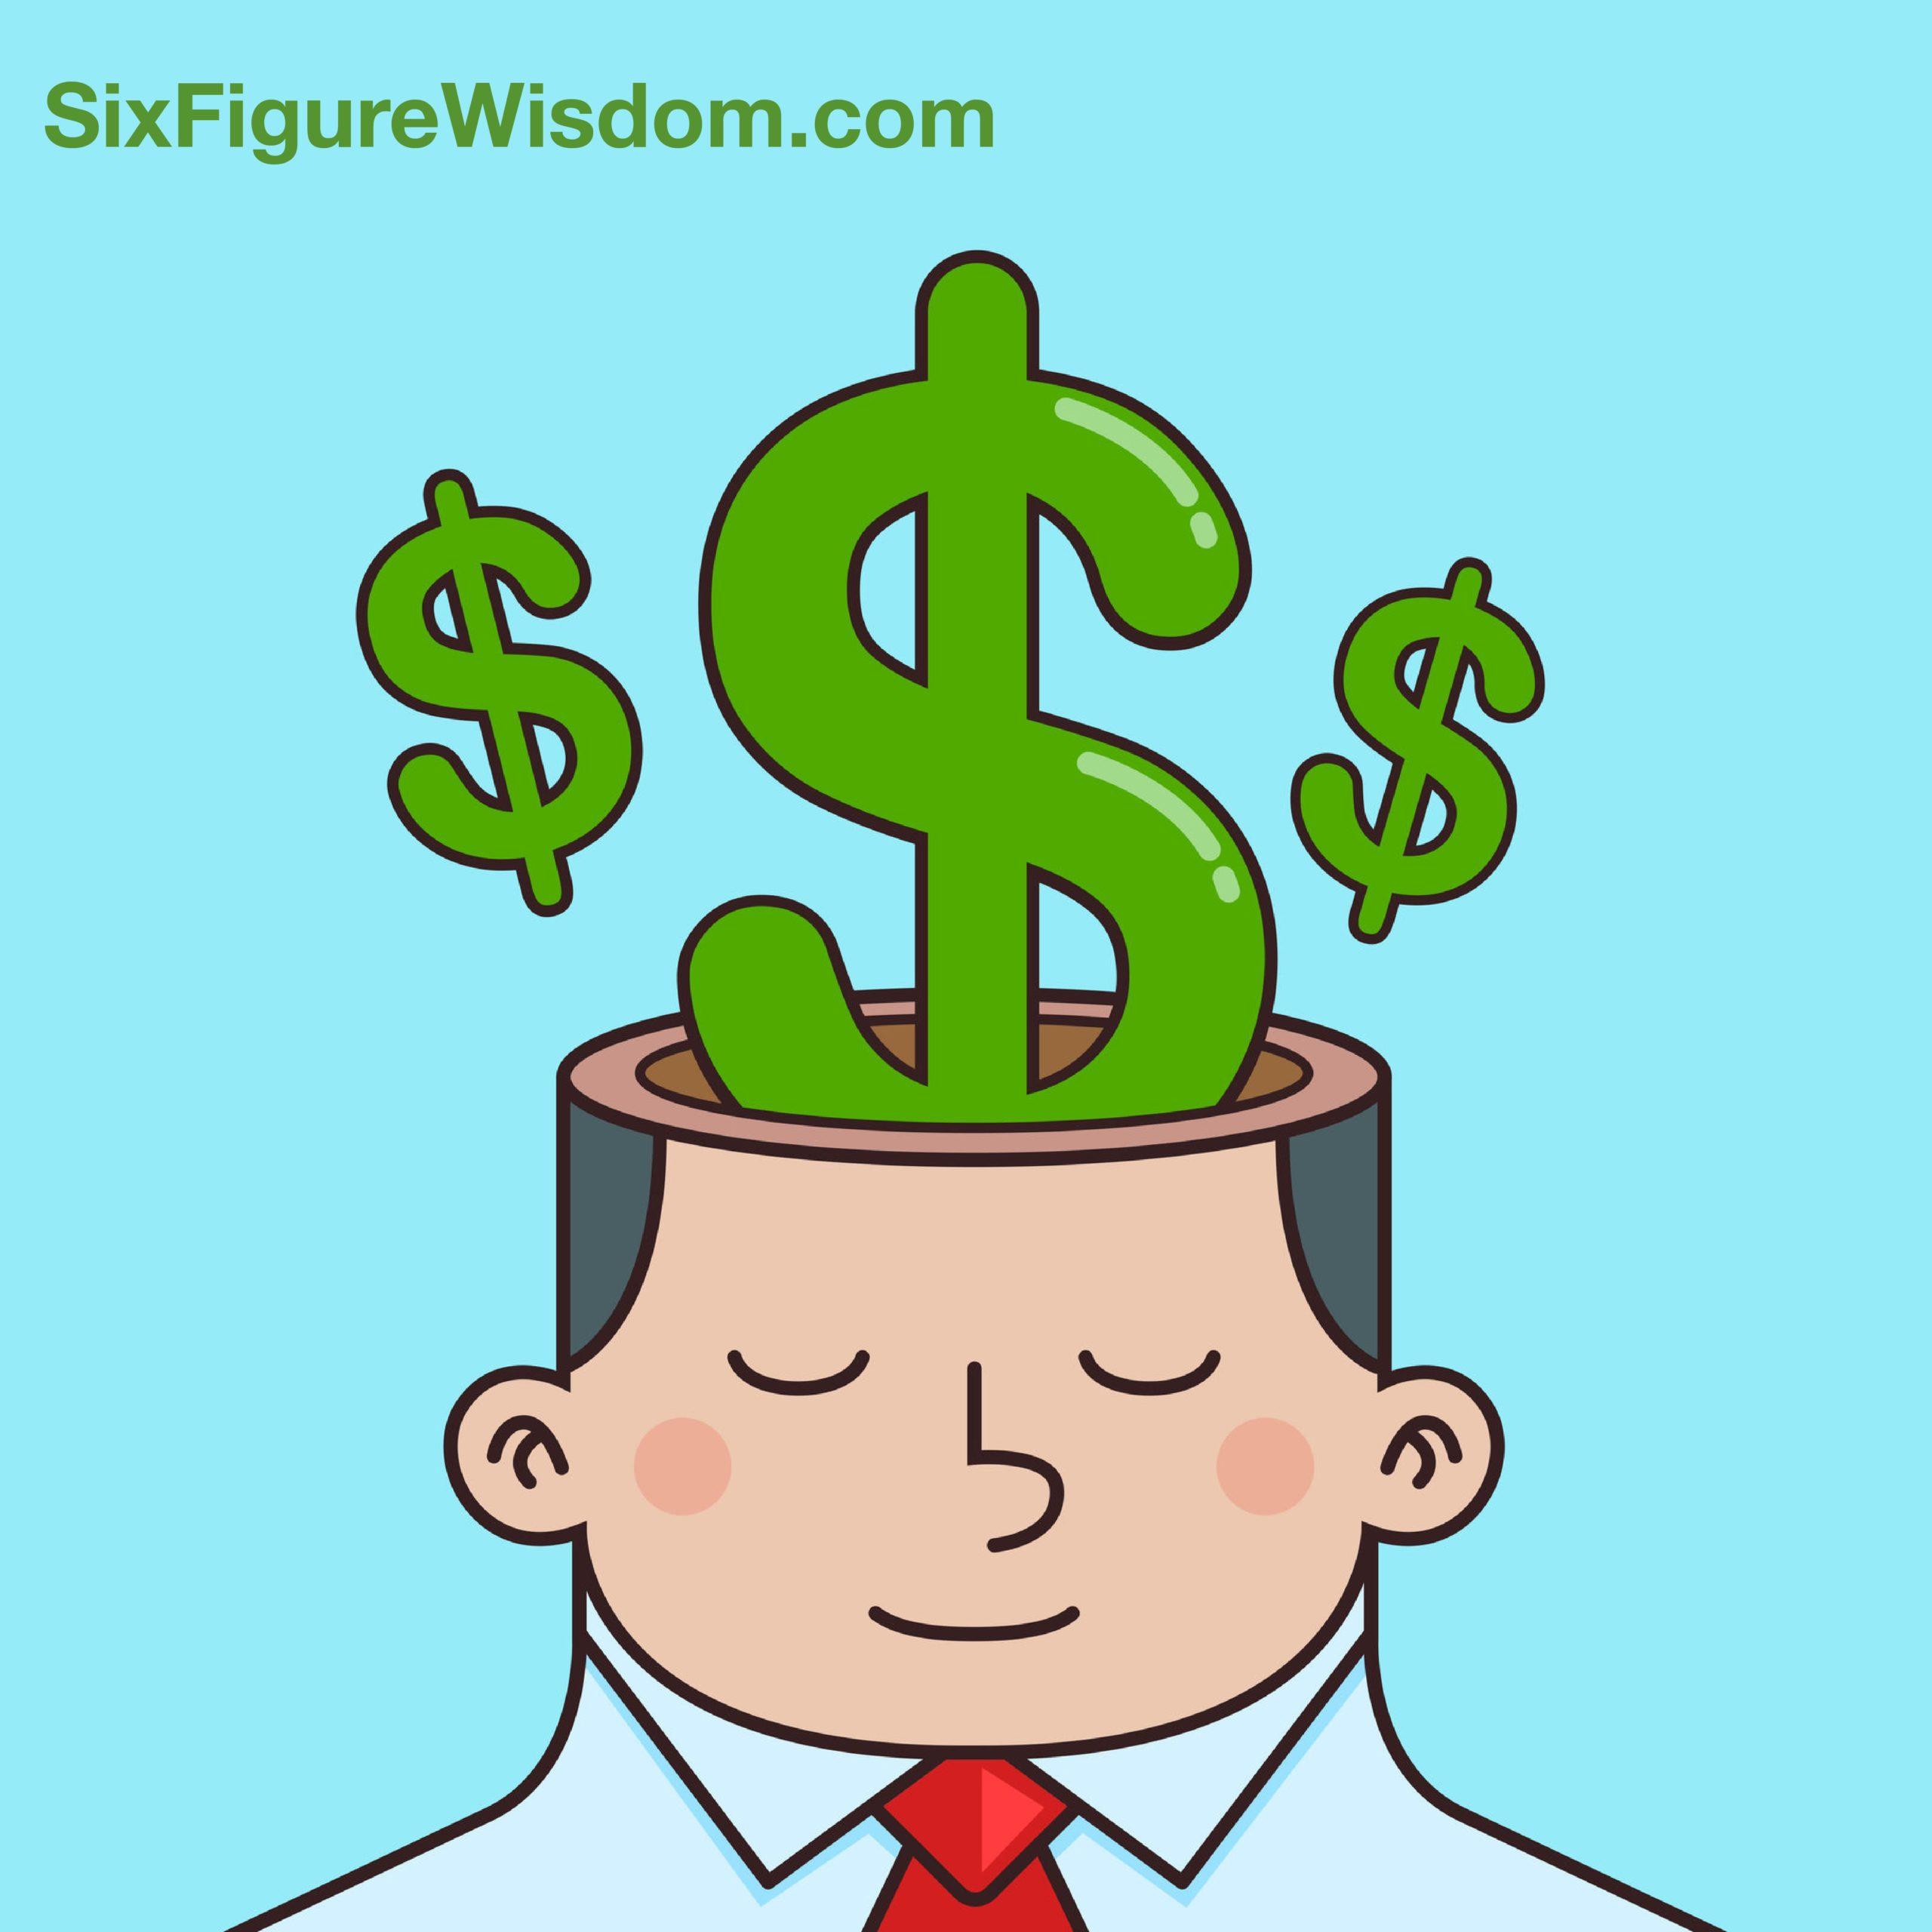 Six_Figure_Wisdom